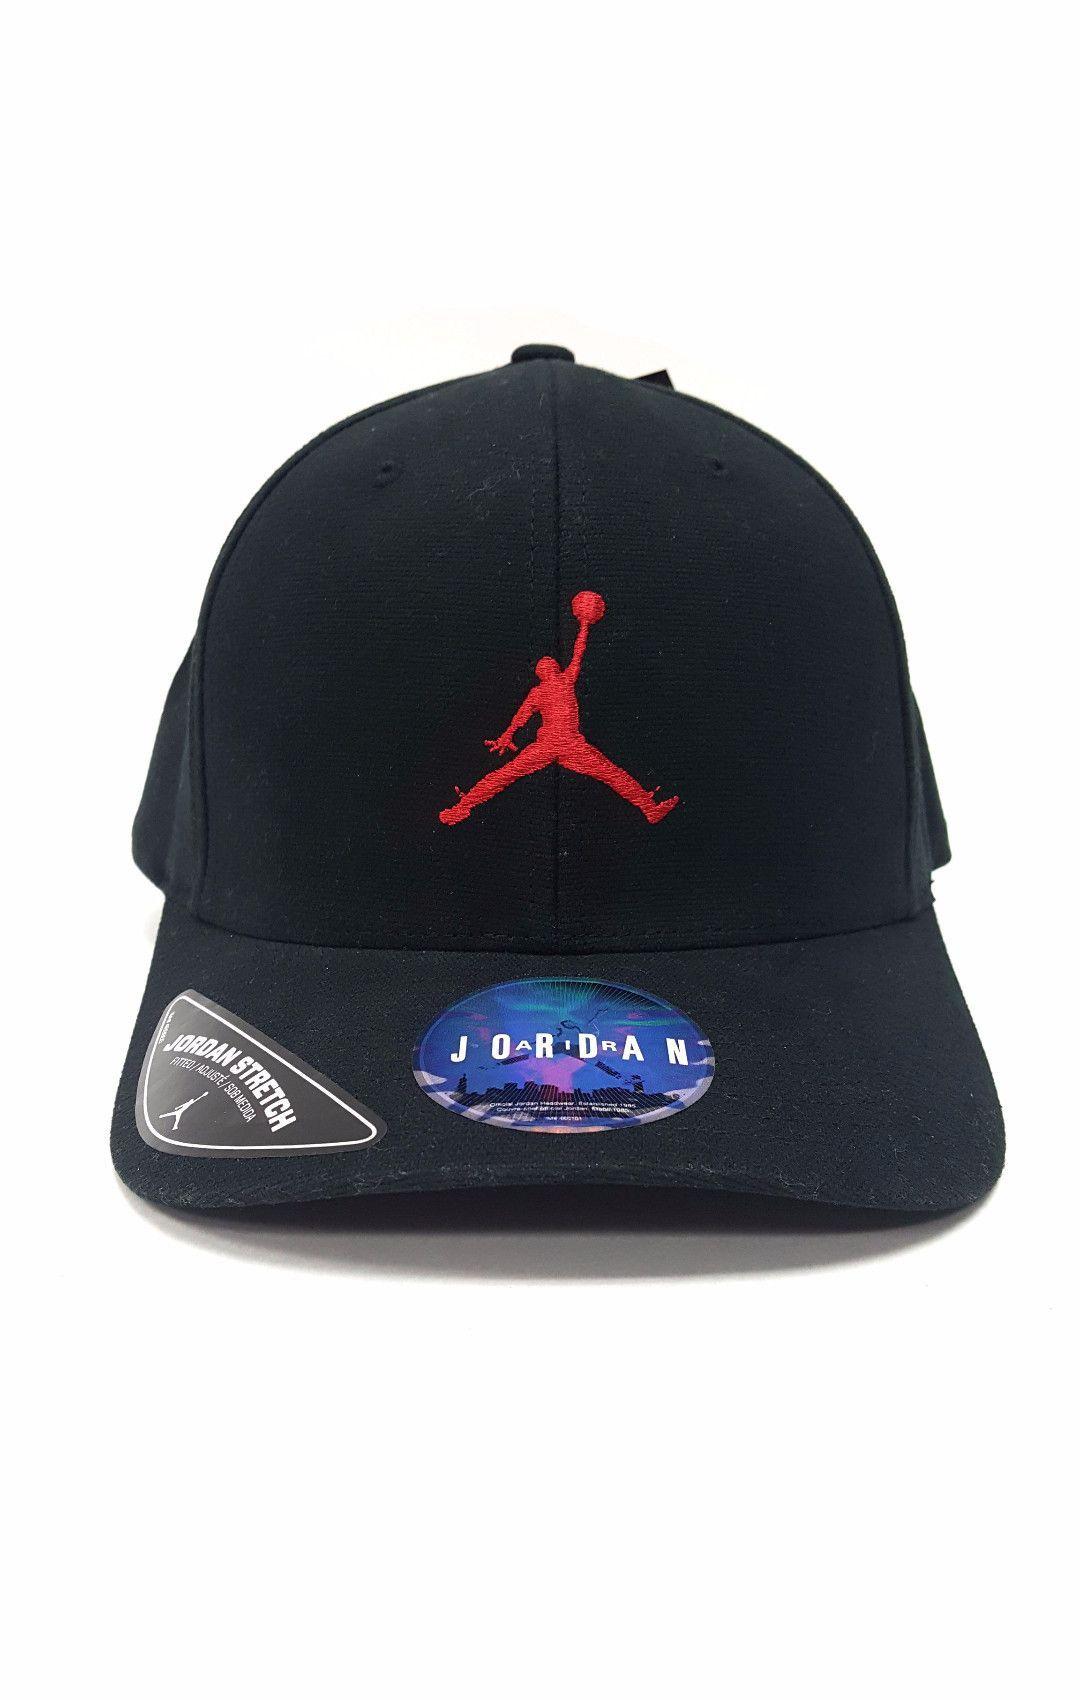 7b9b532e3463 ... official jordan flex fitted stretch hat jumpman black red l xl d0000  e7366